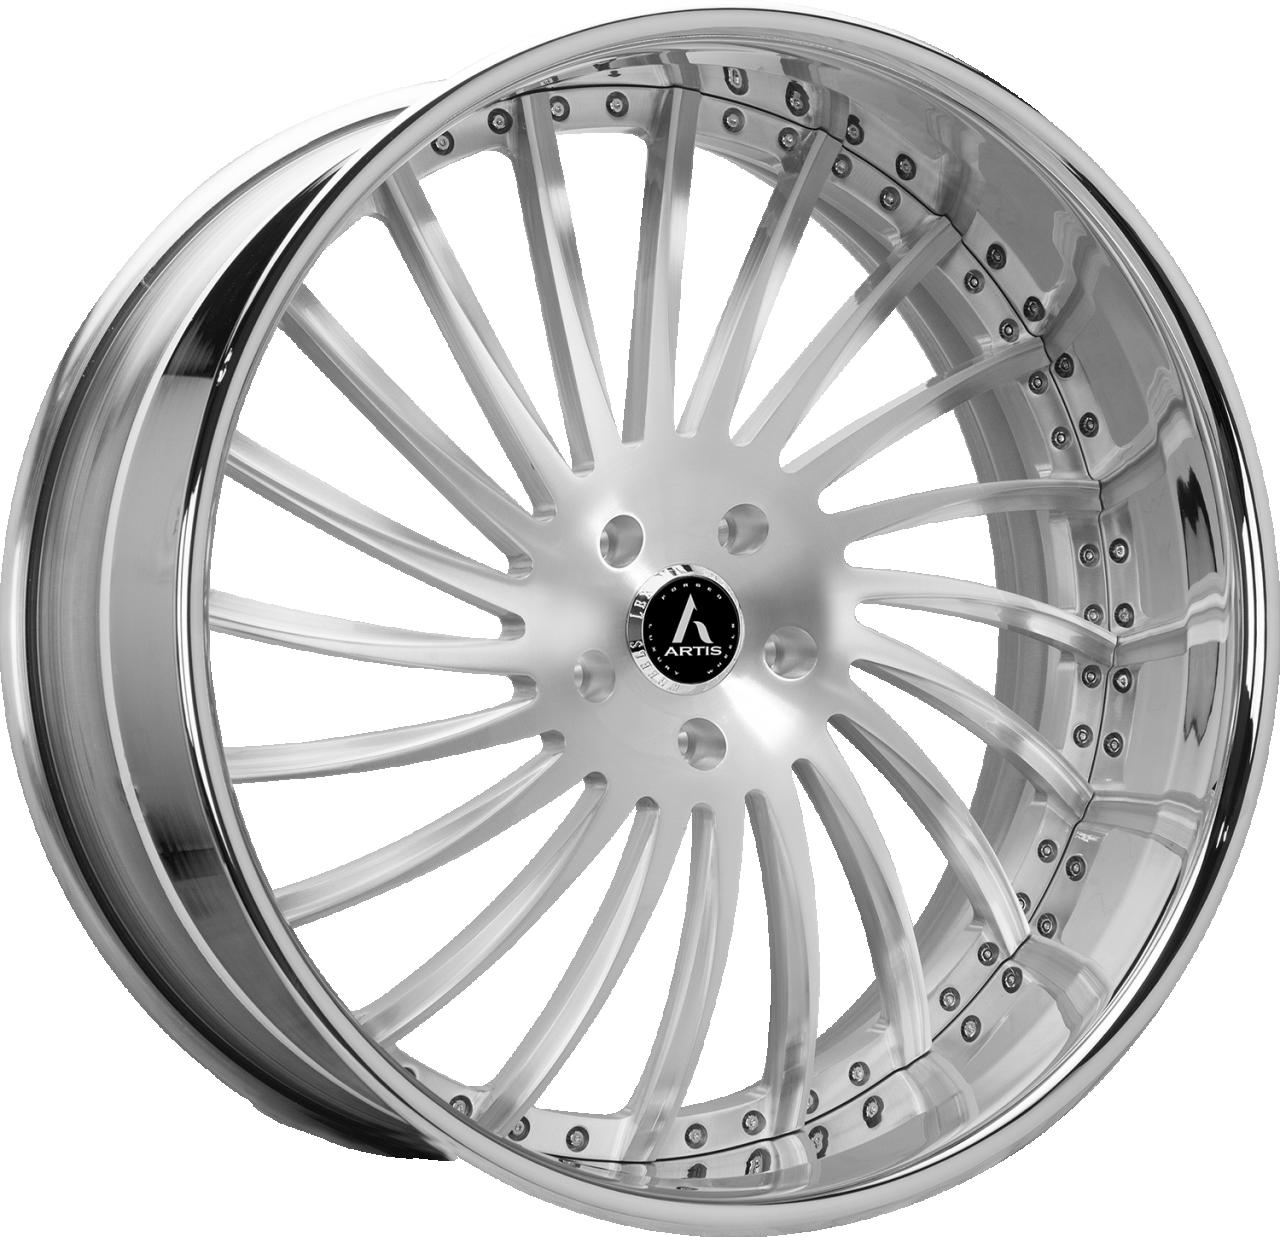 Artis Forged International wheel with Brushed finish